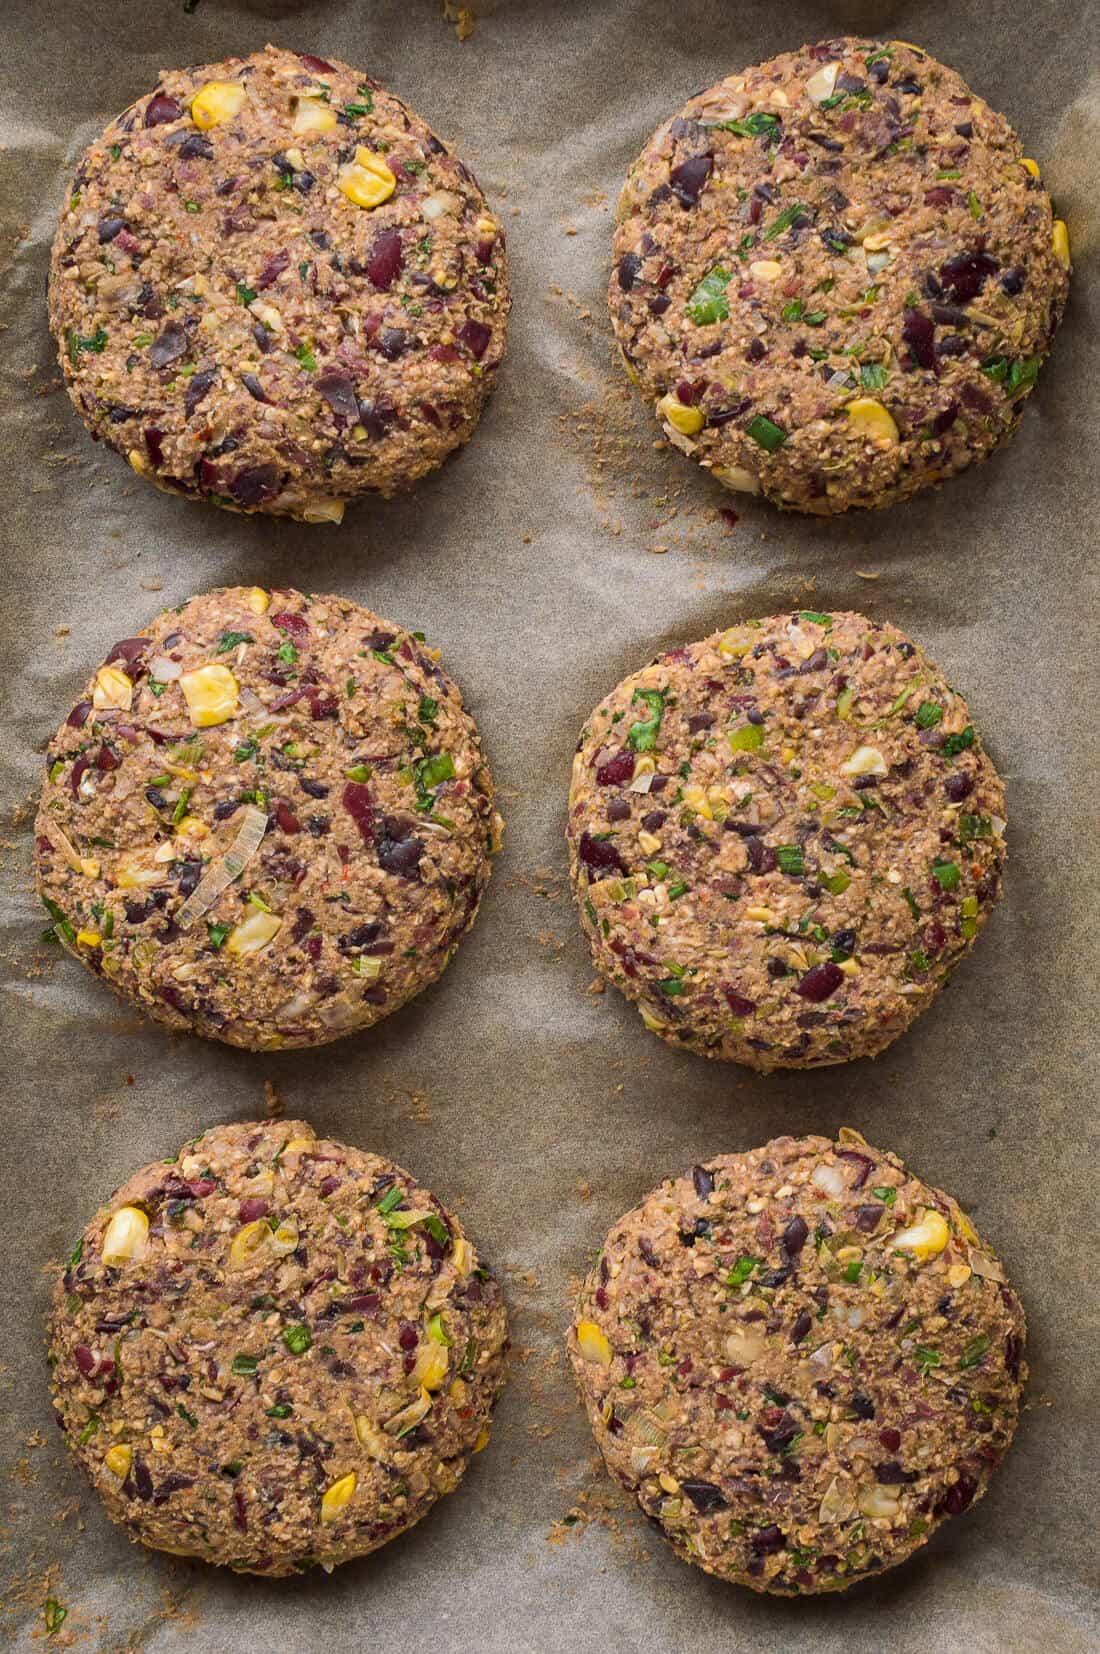 Uncooked vegan mexican black and kidney bean burger patties